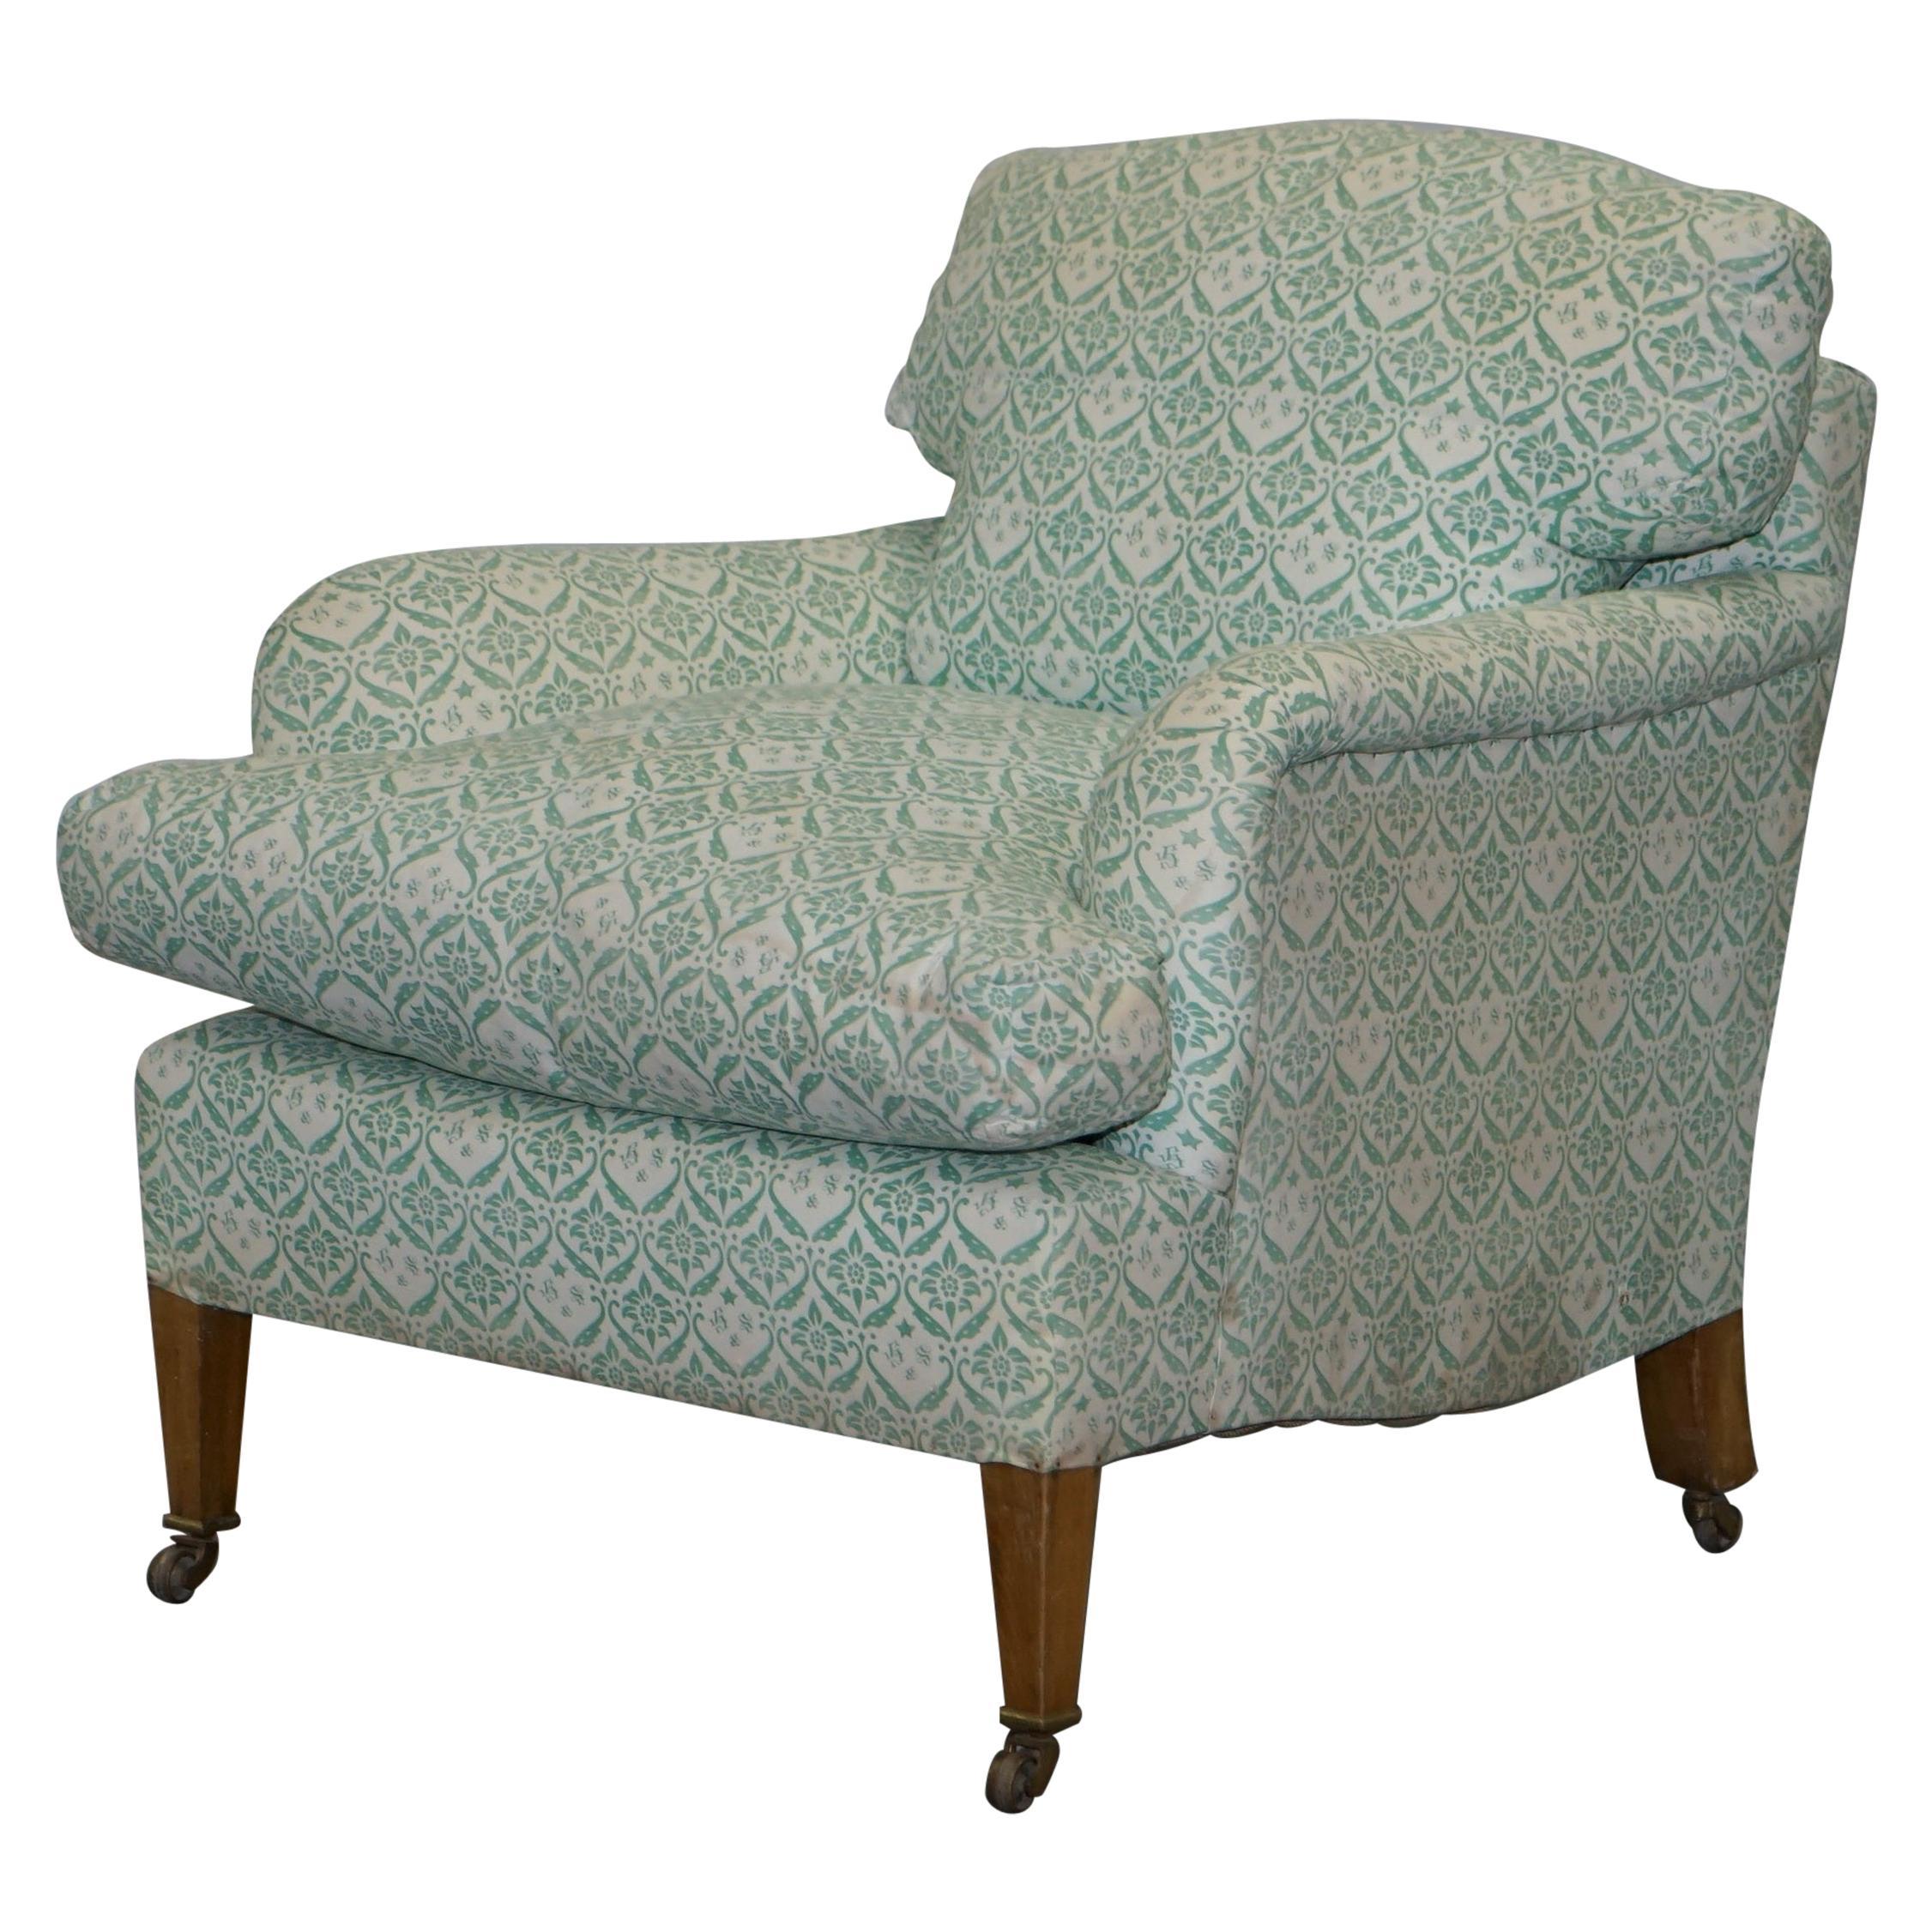 Rare 1954-1959 Howard & Son's Lenygon & Morant Armchair Original Ticking Fabric